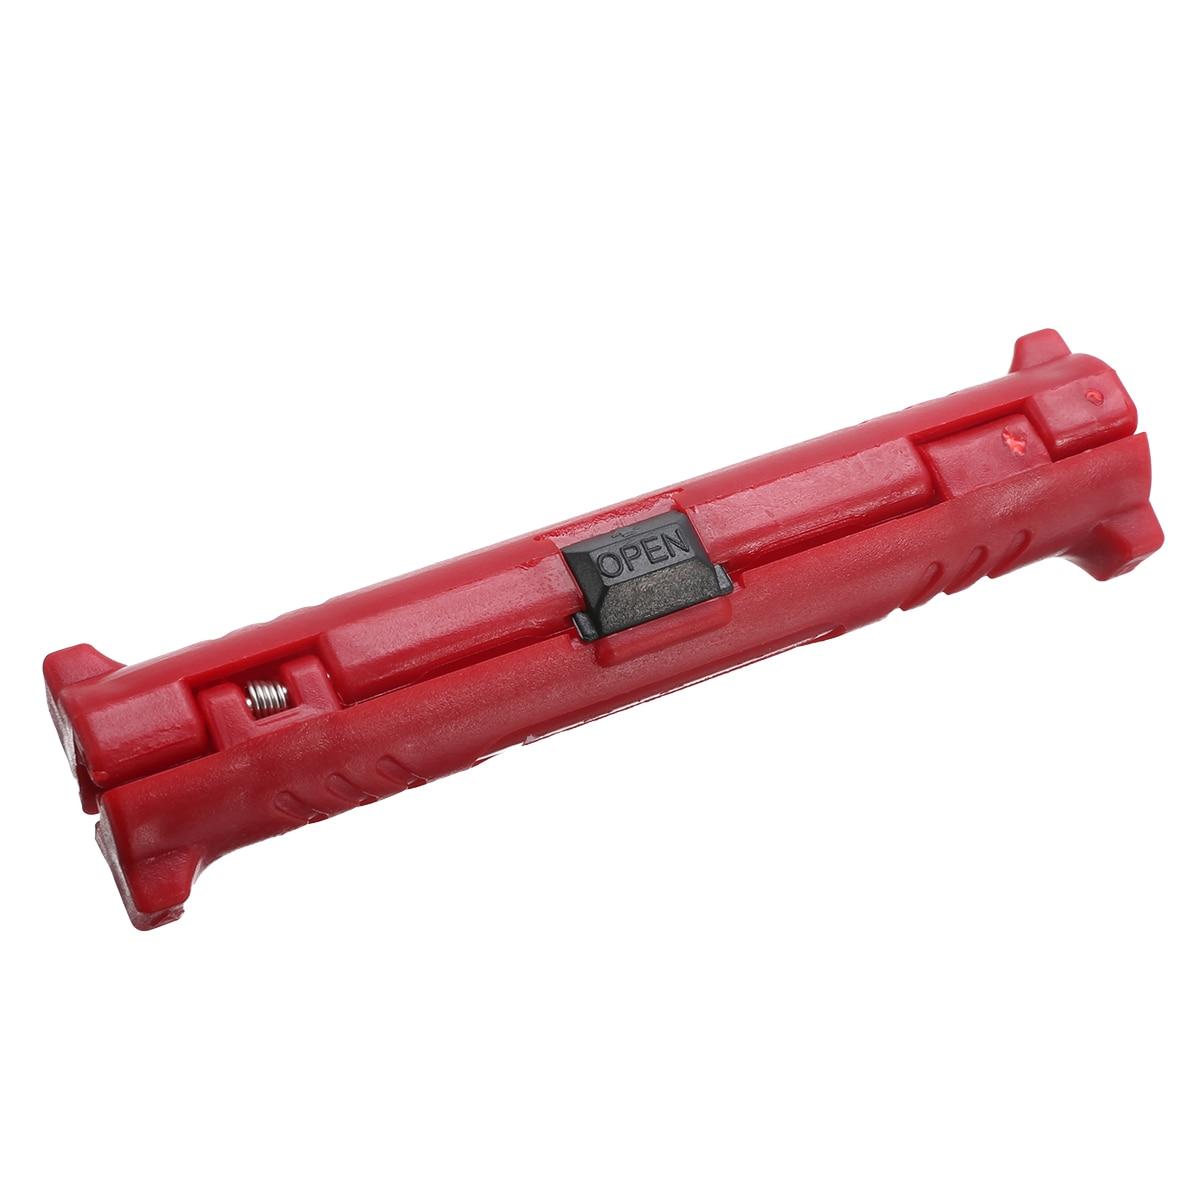 Multifunción Pelacables eléctrico pluma rotativa Cable Coaxial cúter tipo pluma Pelacables alicates herramienta para pelar cables